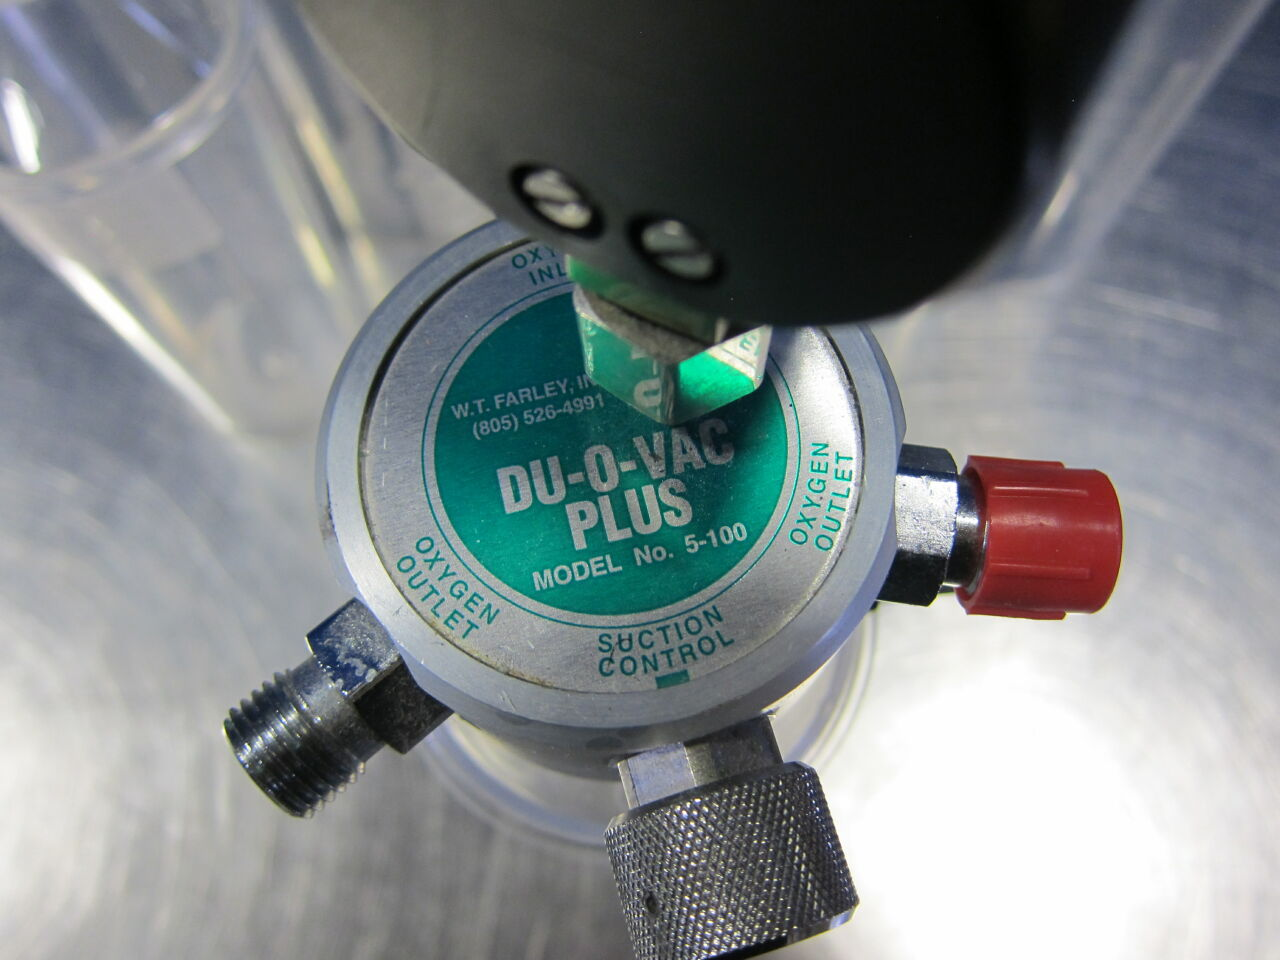 WT FARLEY INC Duo Vac Plus  - Lot of 6 Vacuum Equipment